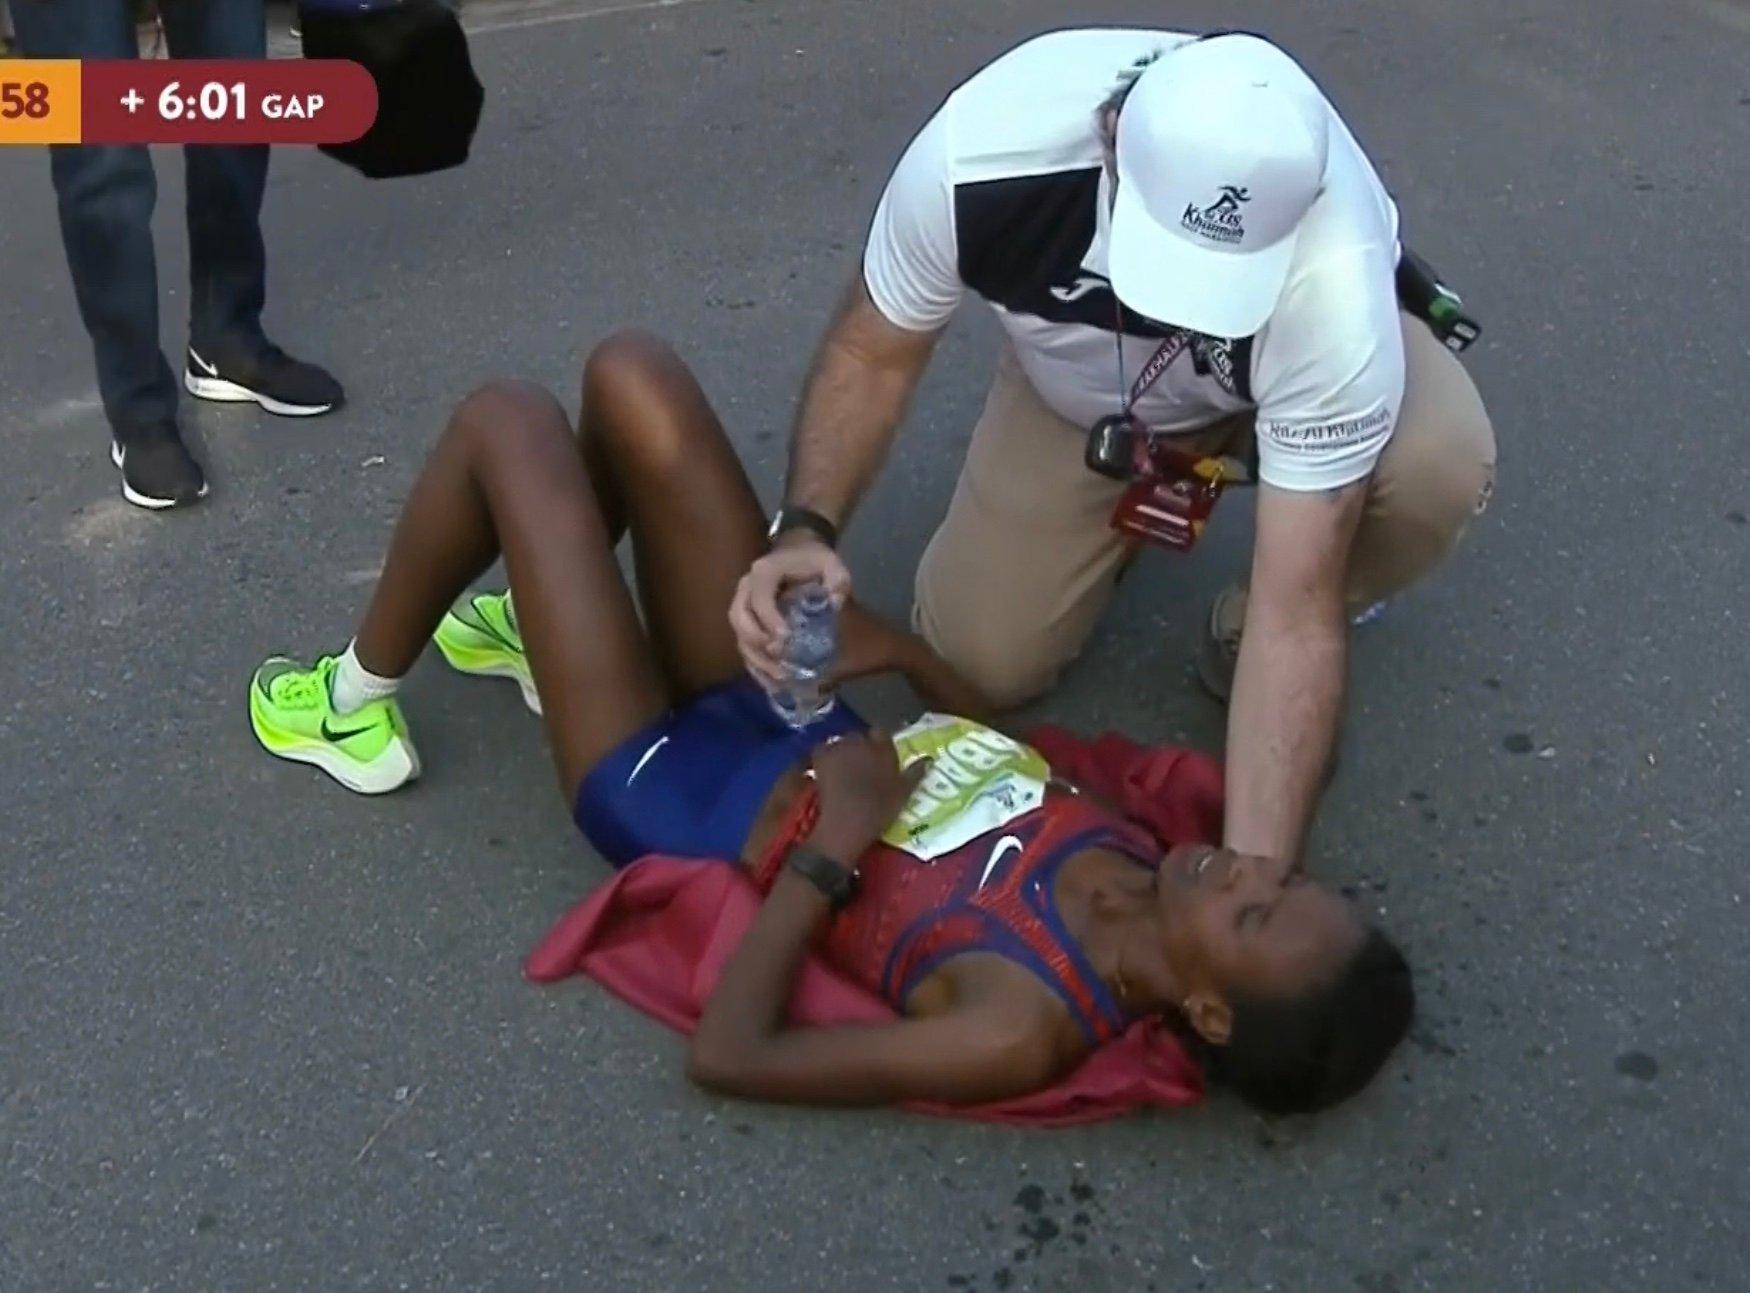 Ethiopia's Ababel Yeshaneh Upsets Brigid Kosgei and Smashes Half Marathon World Record at 2020 RAK Half Marathon